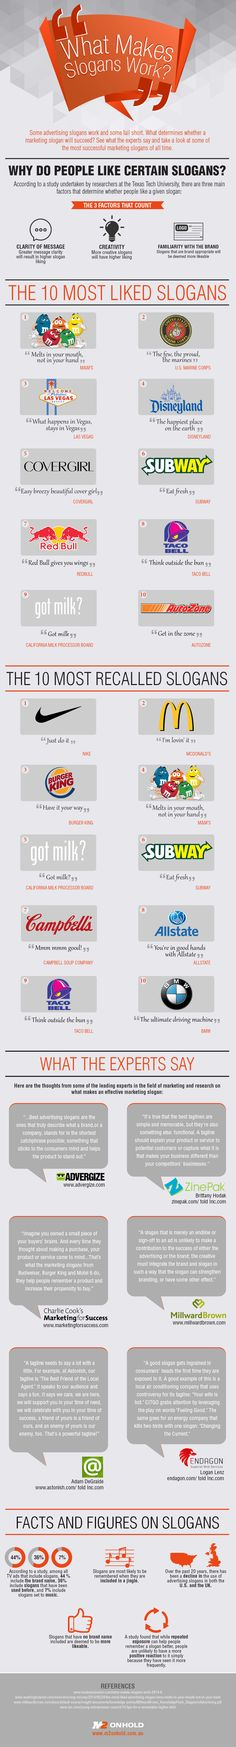 what makes slogans work #marketing #branding